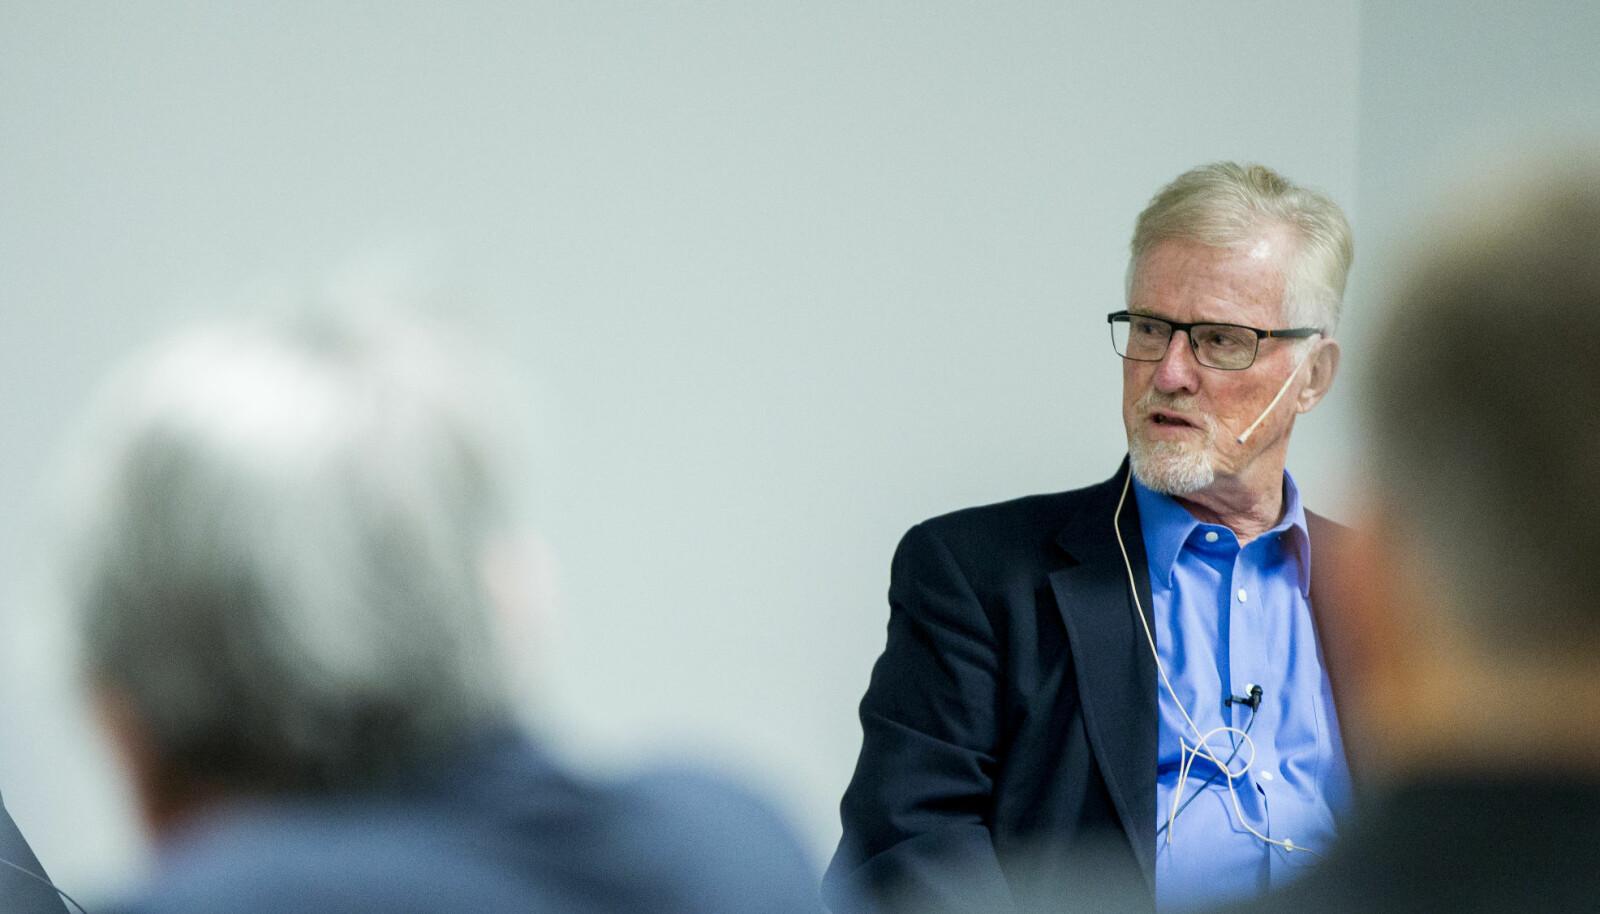 Tidligere kunnskapsminister Gudmund Hernes.